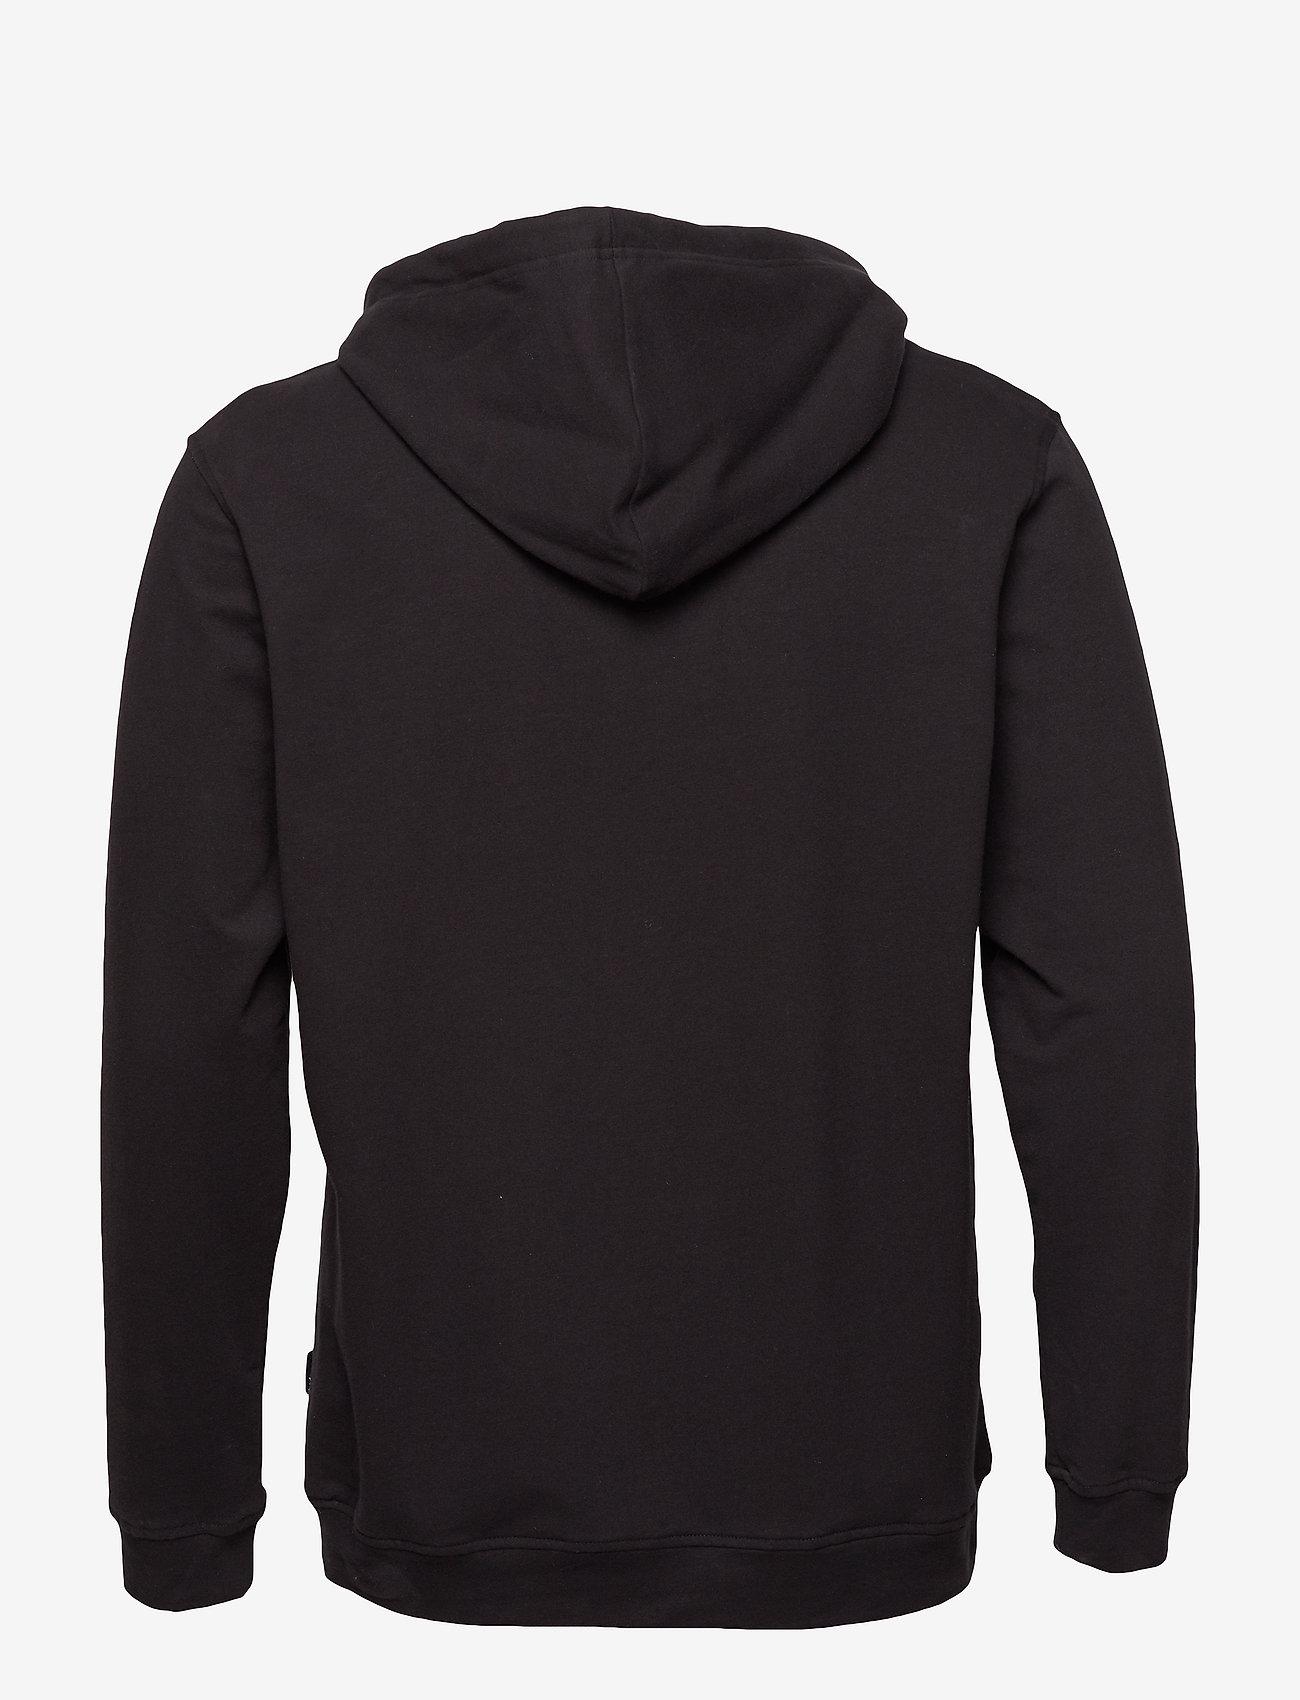 JBS of Denmark JBS of Denmark, sweat hoodie - Sweatshirts BLACK - Menn Klær